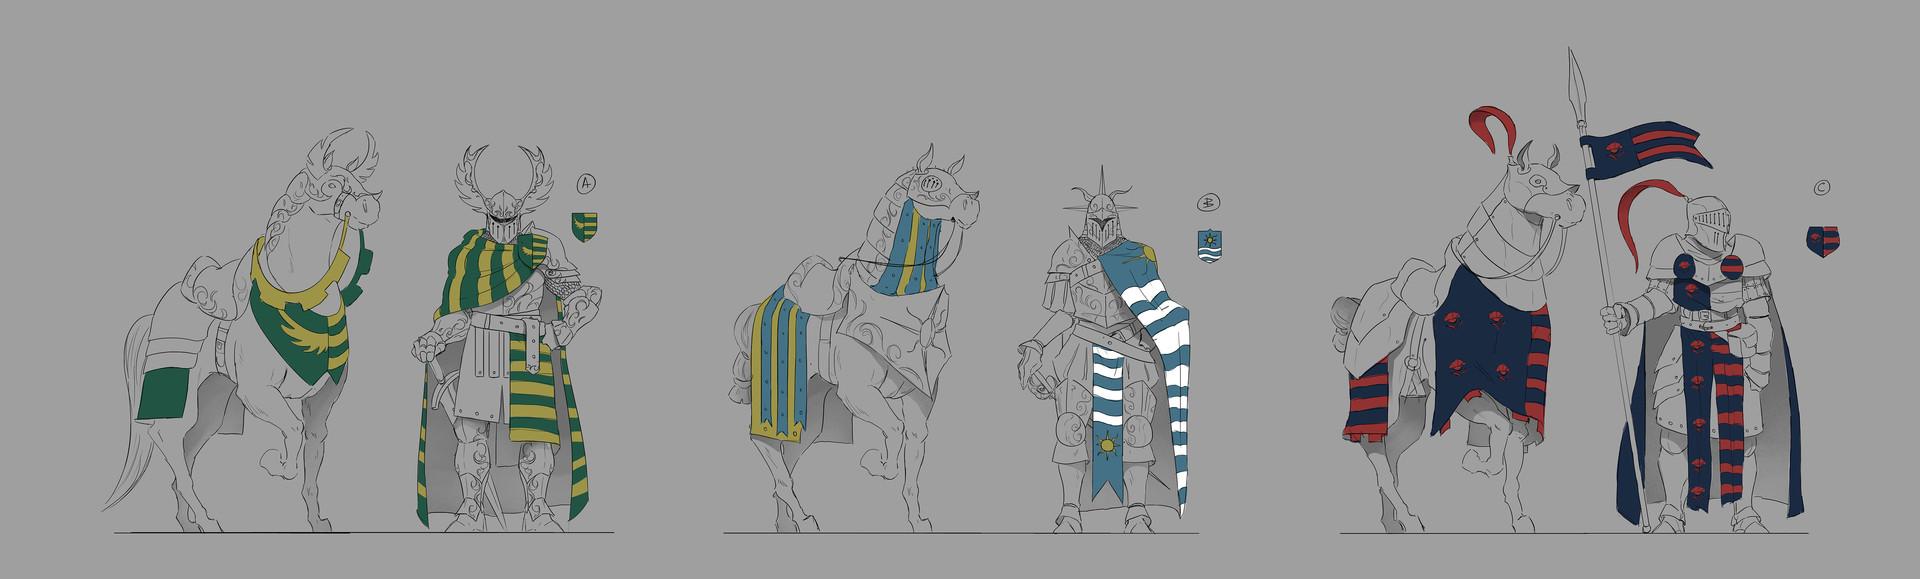 Ricardo coelho concepts order knight 03